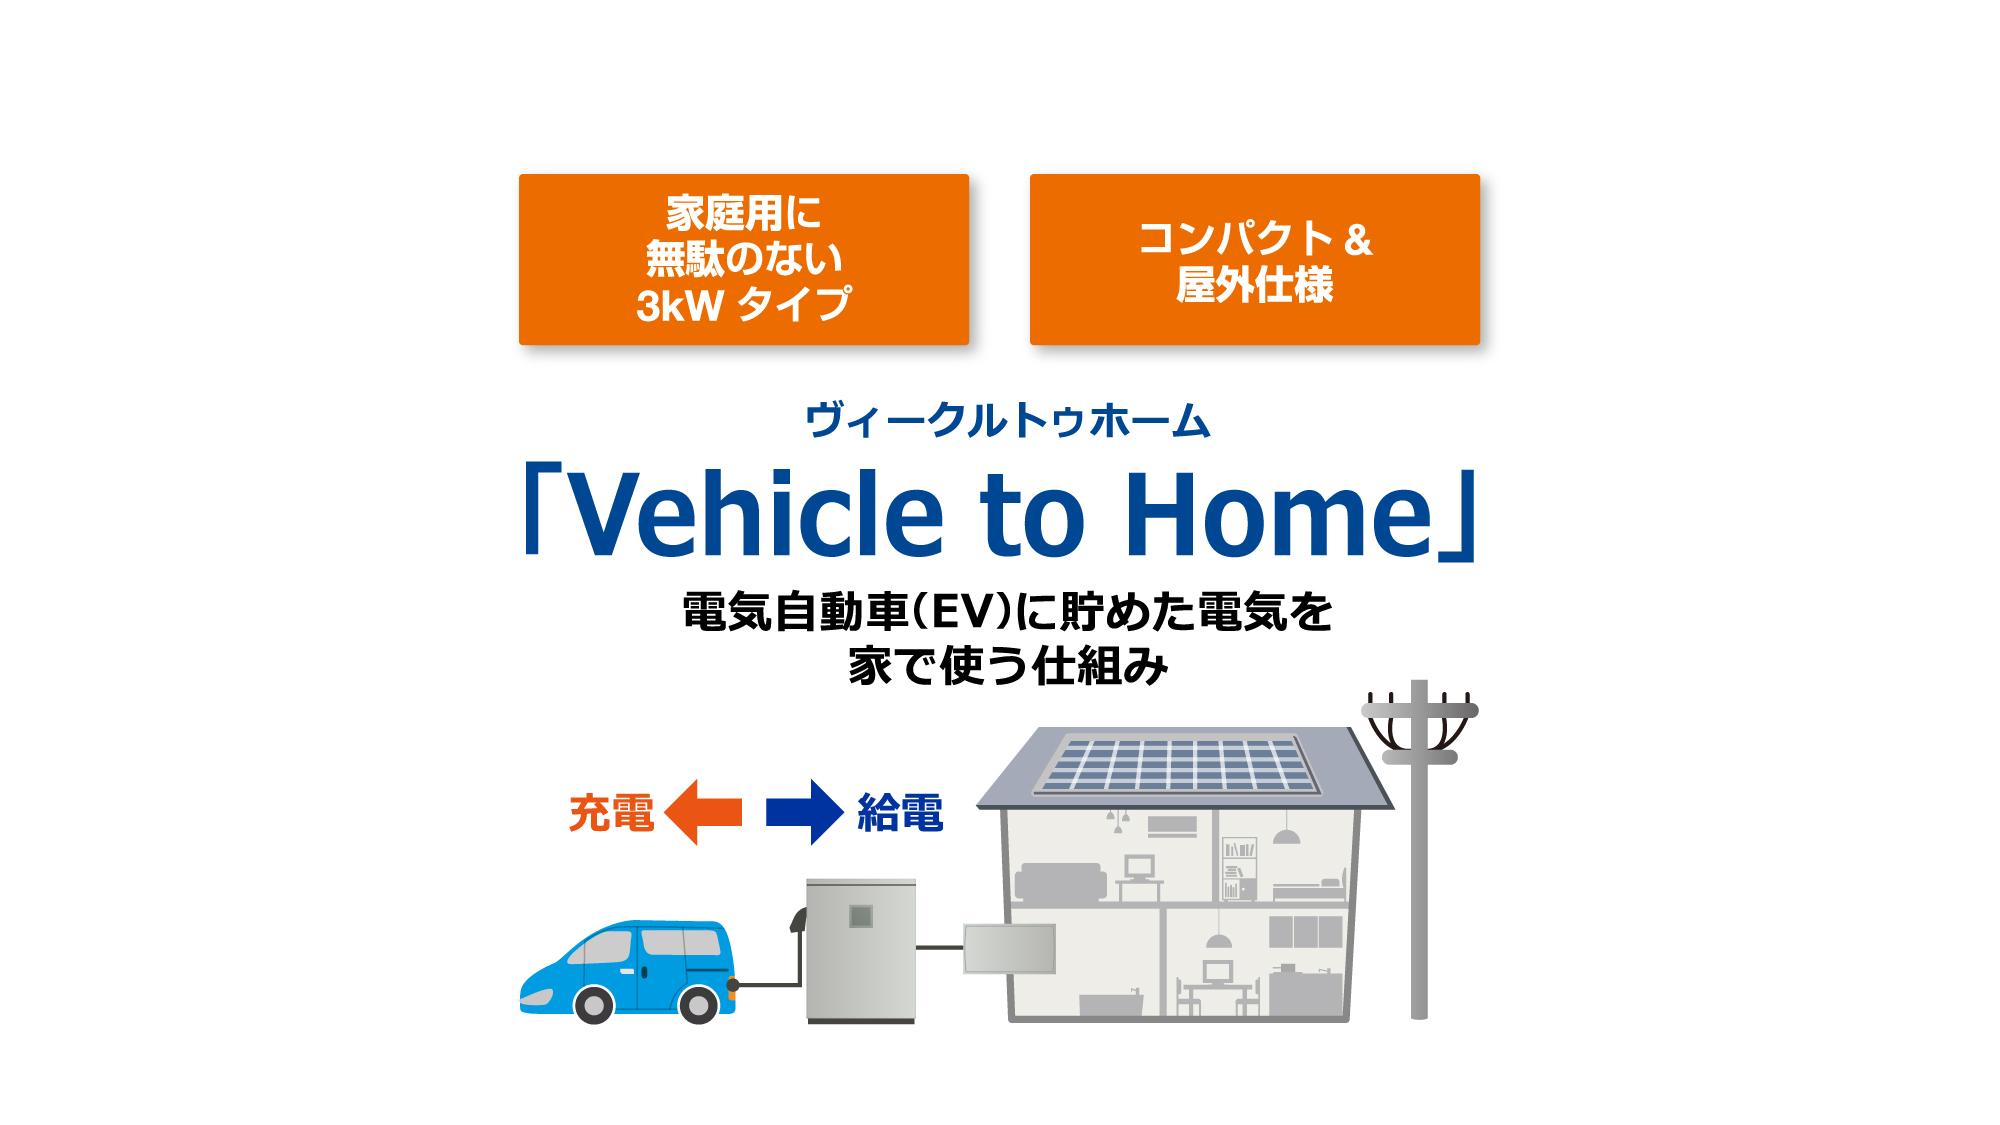 Vehicle to Home ヴィークルトゥホーム